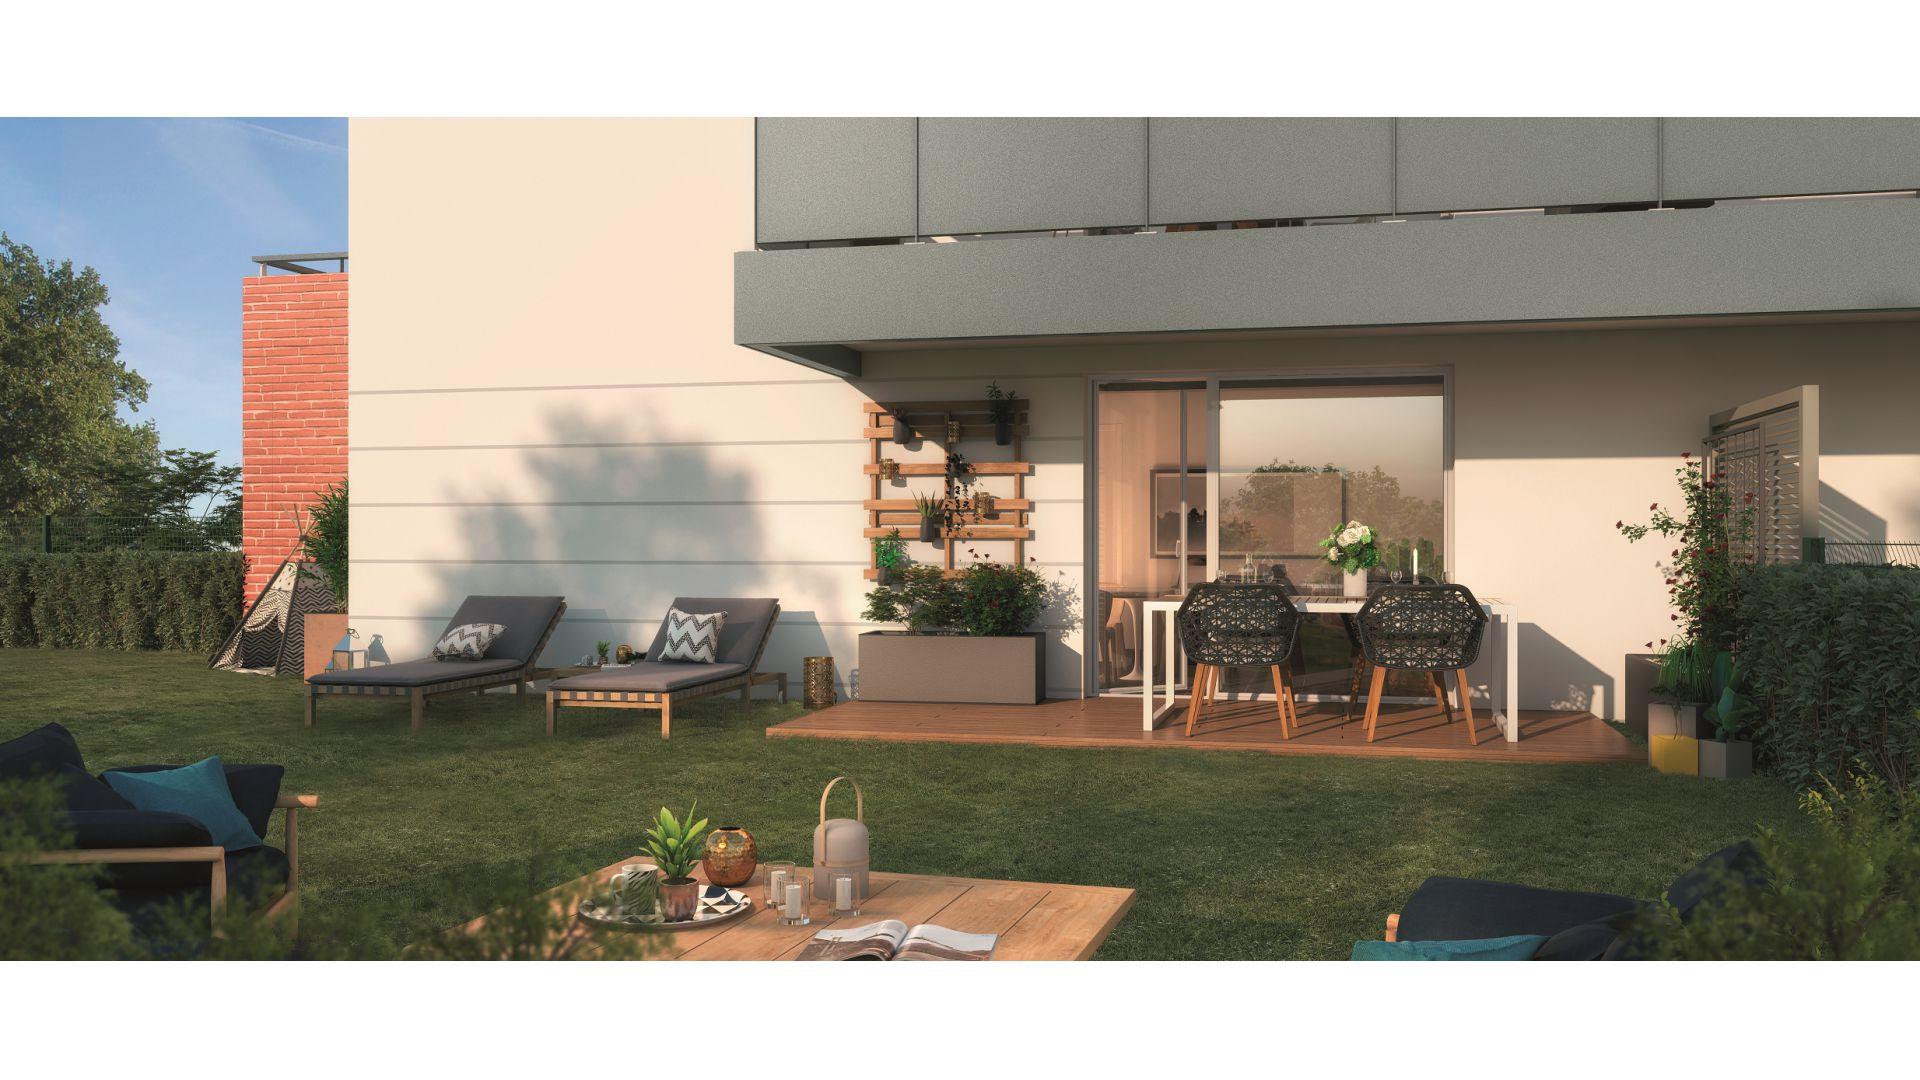 GreenCity immobilier - Clos Cassandre - 31700 Blagnac - appartements neufs du T1Bis au T5Duplex - terrasse